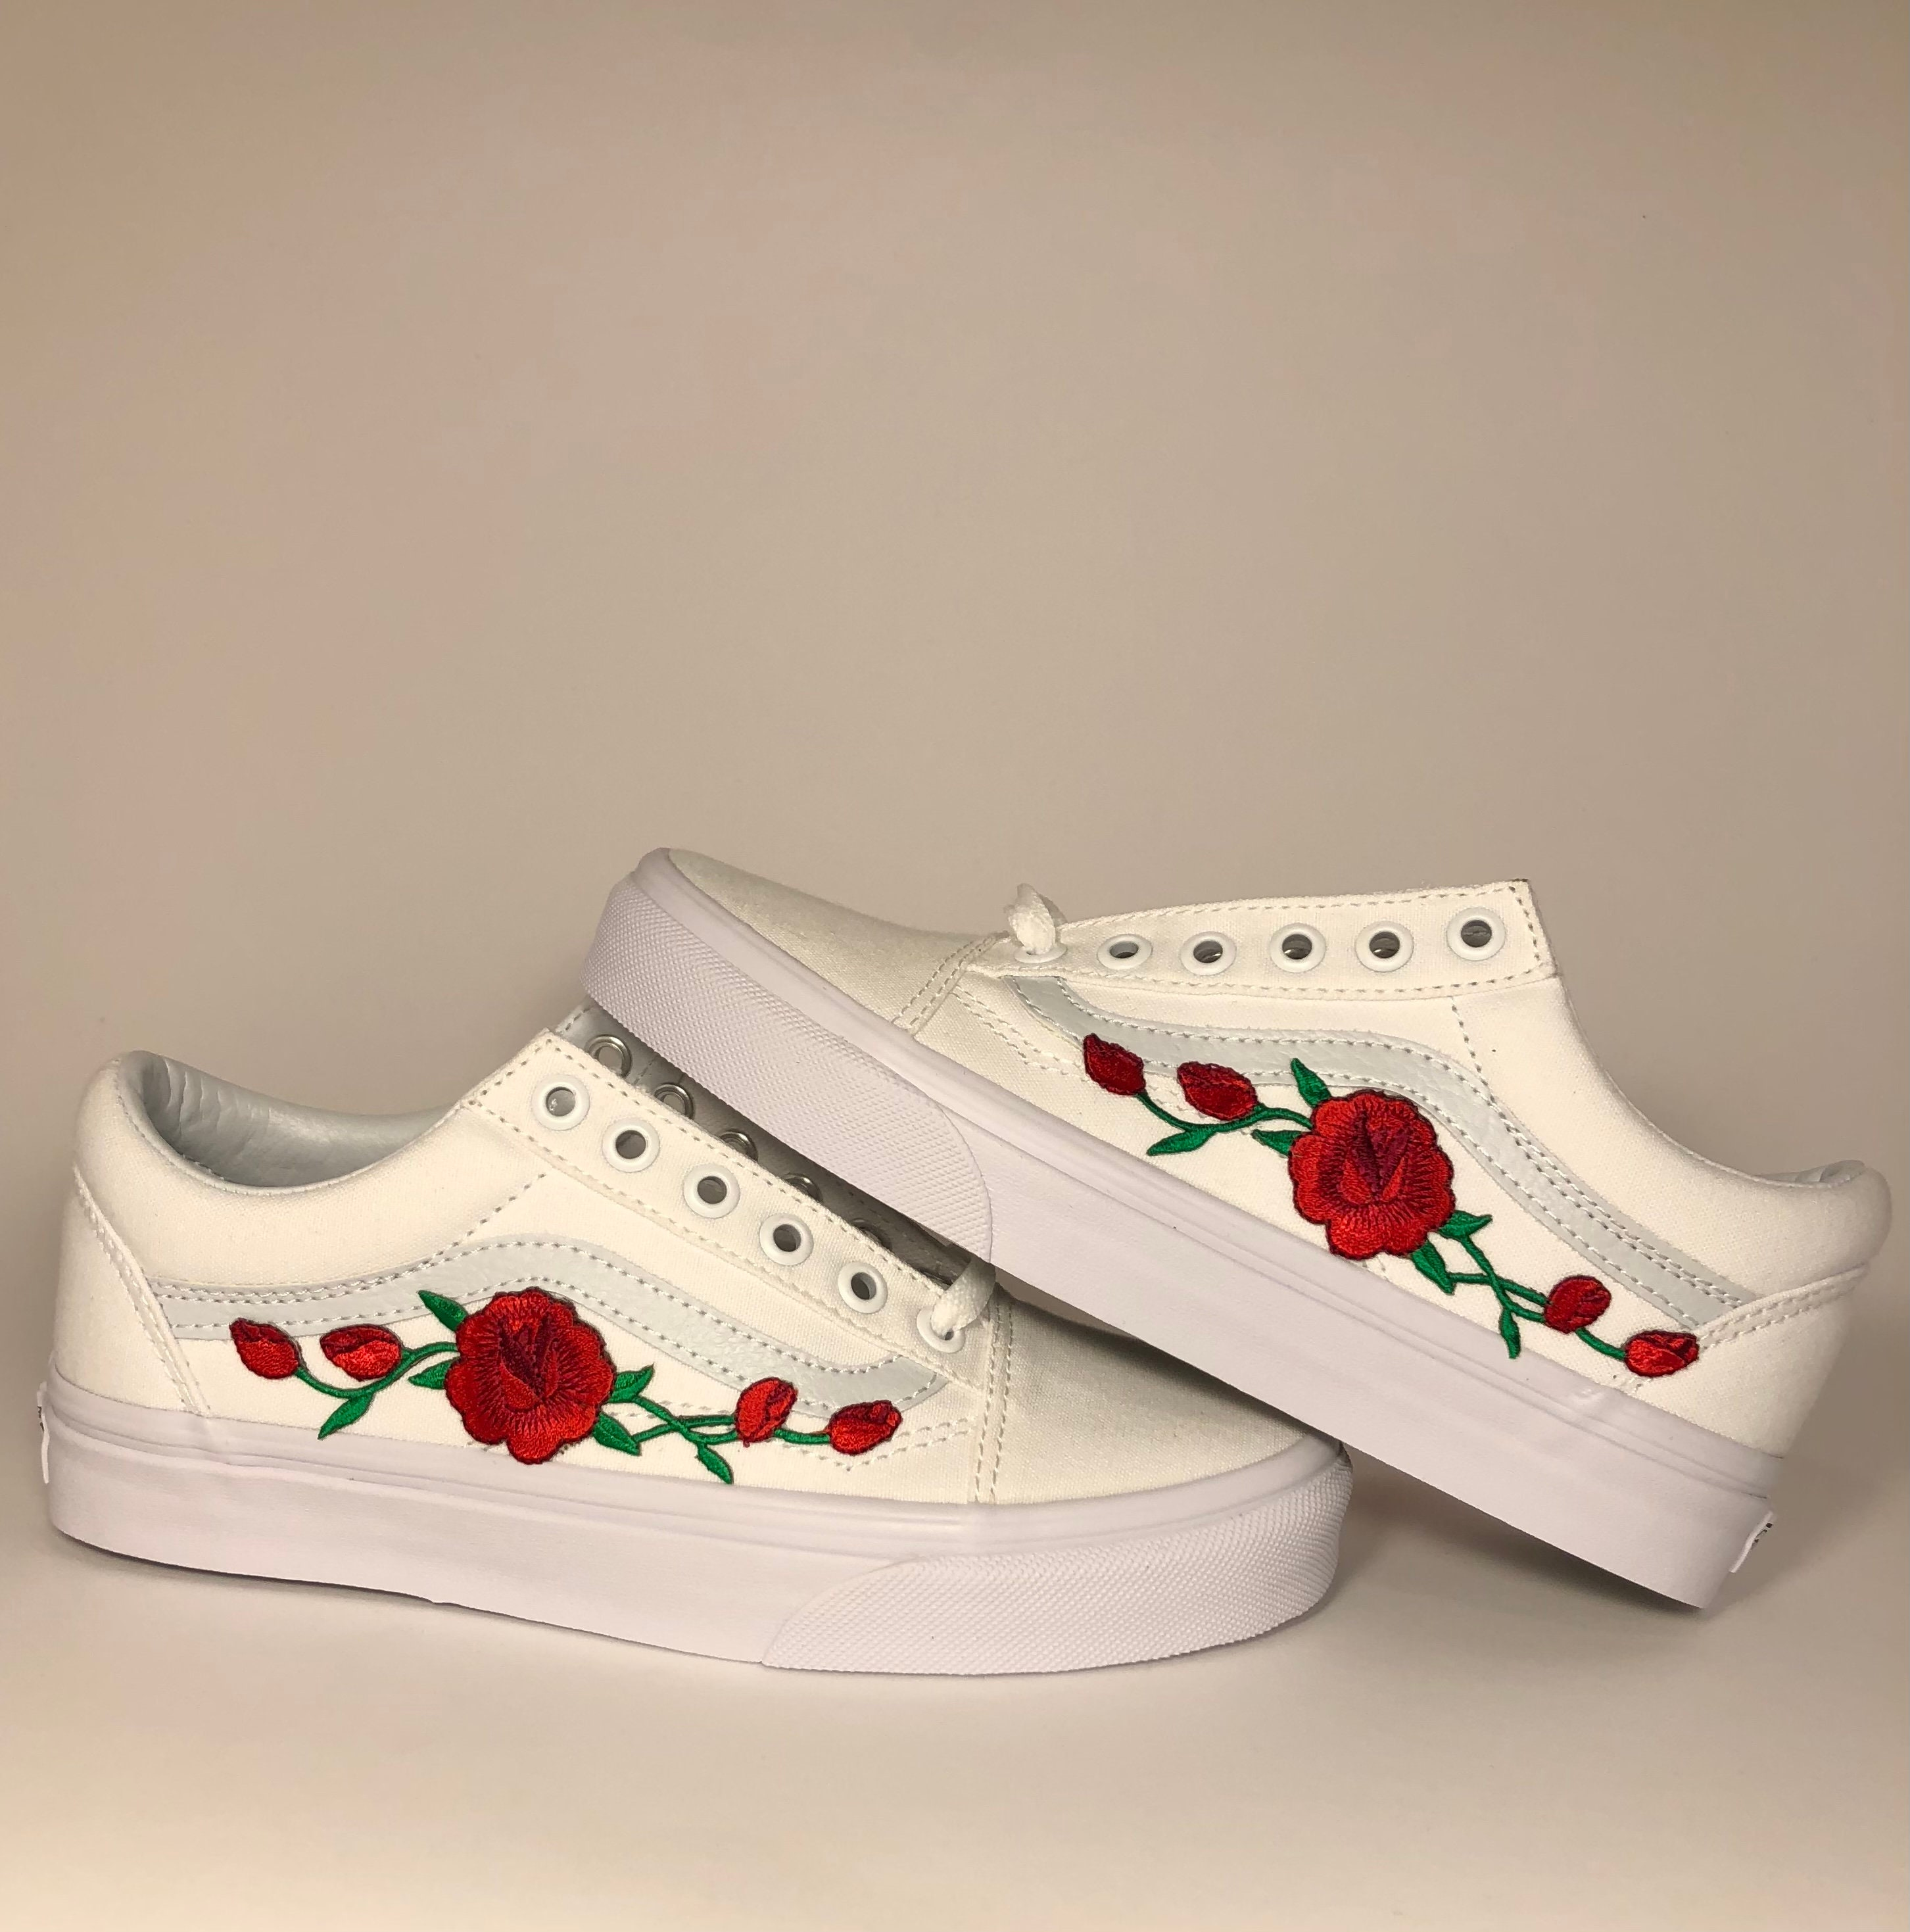 White Vans Old Skool Custom Rose Embroidered Shoes-Vans Rose Shoes Floral Vans-Custom Vans Rose Vans Old Skool Vans-Men/Women/Youth Sizes